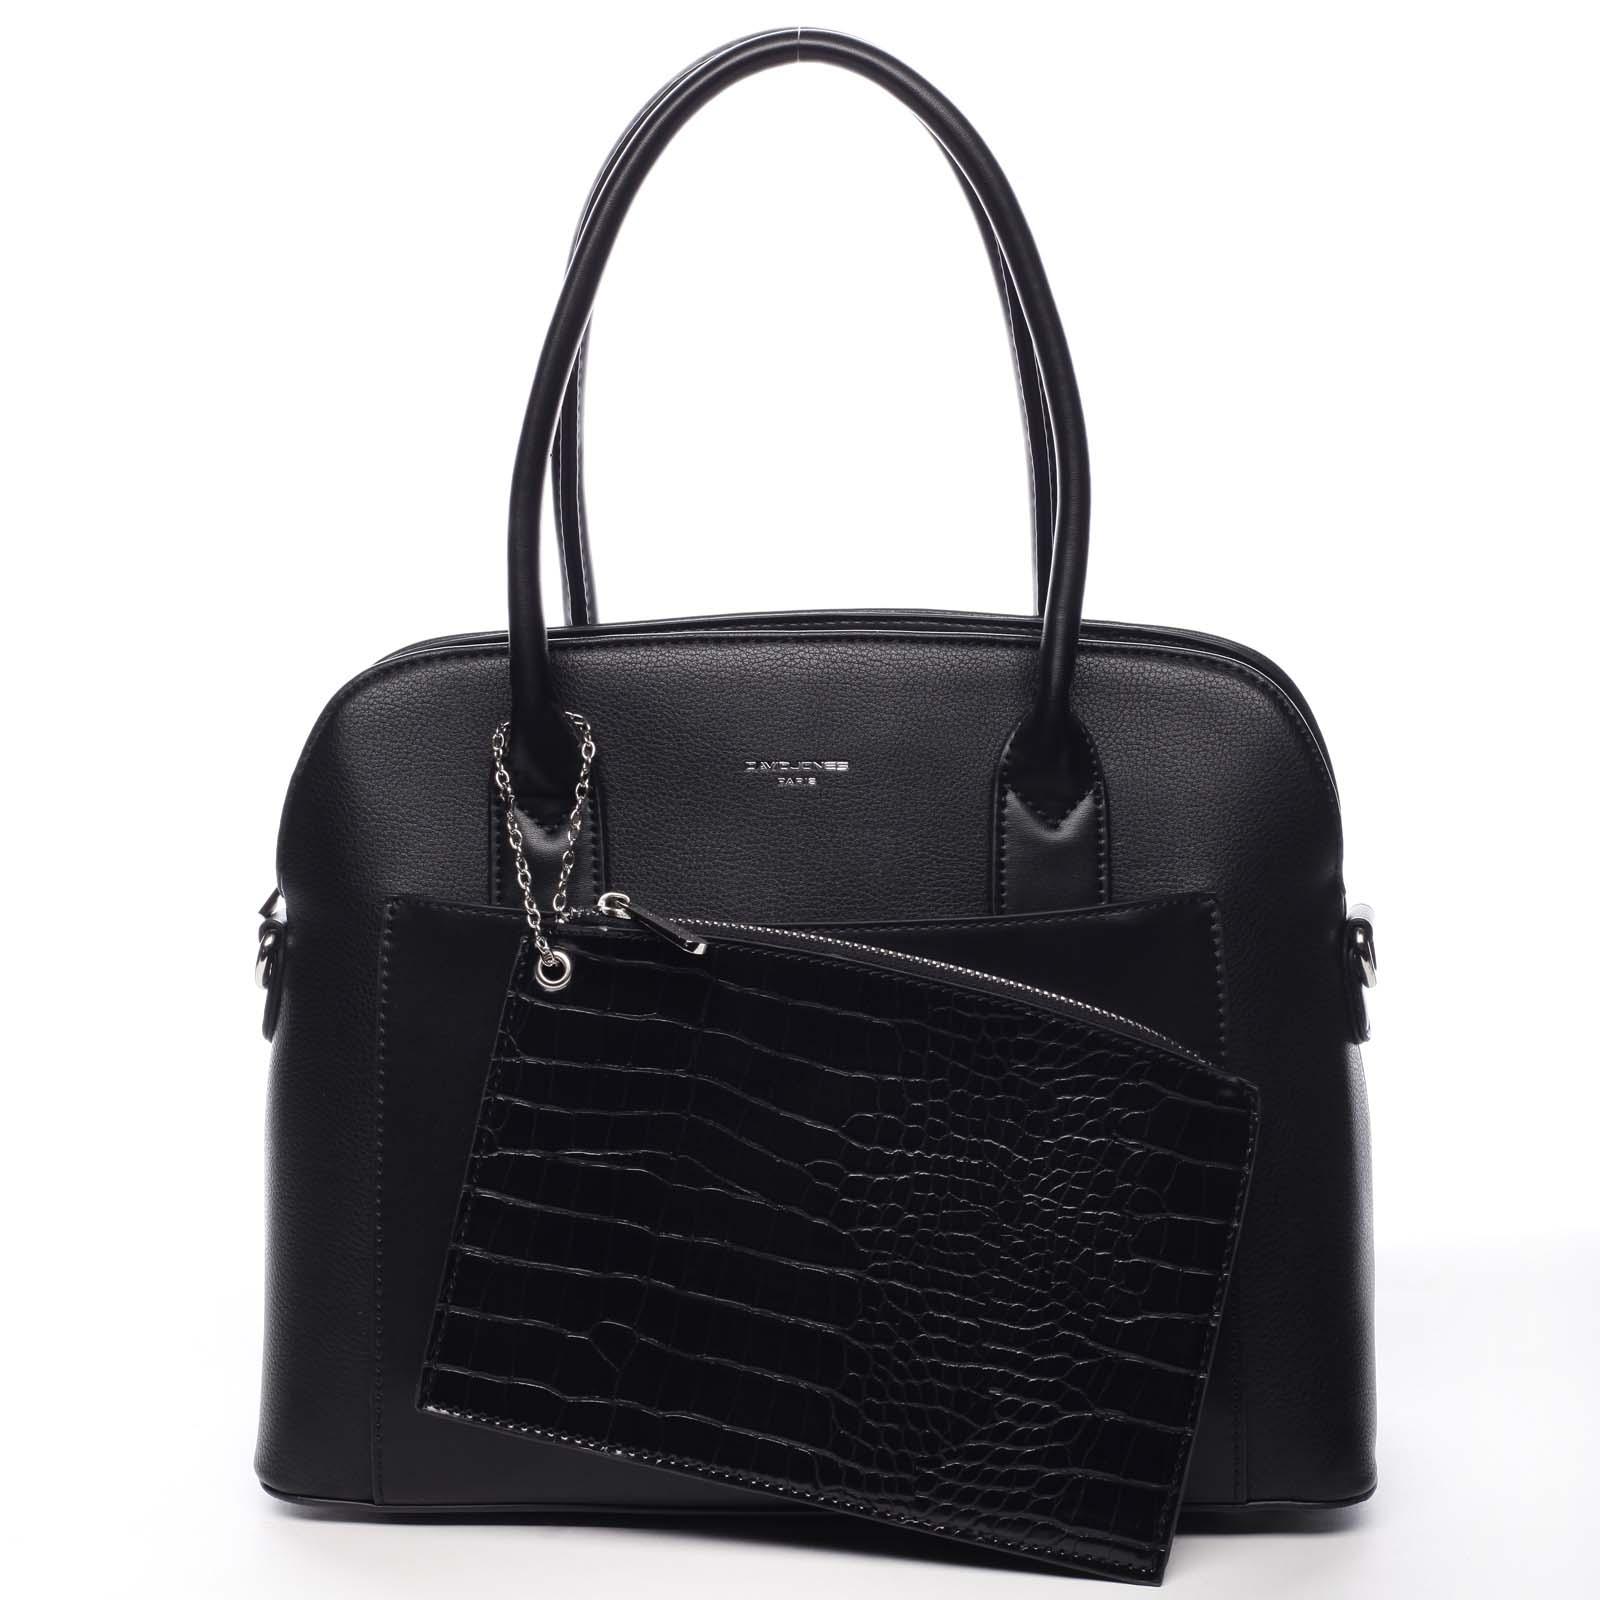 Dámská kabelka černá - David Jones Caleed